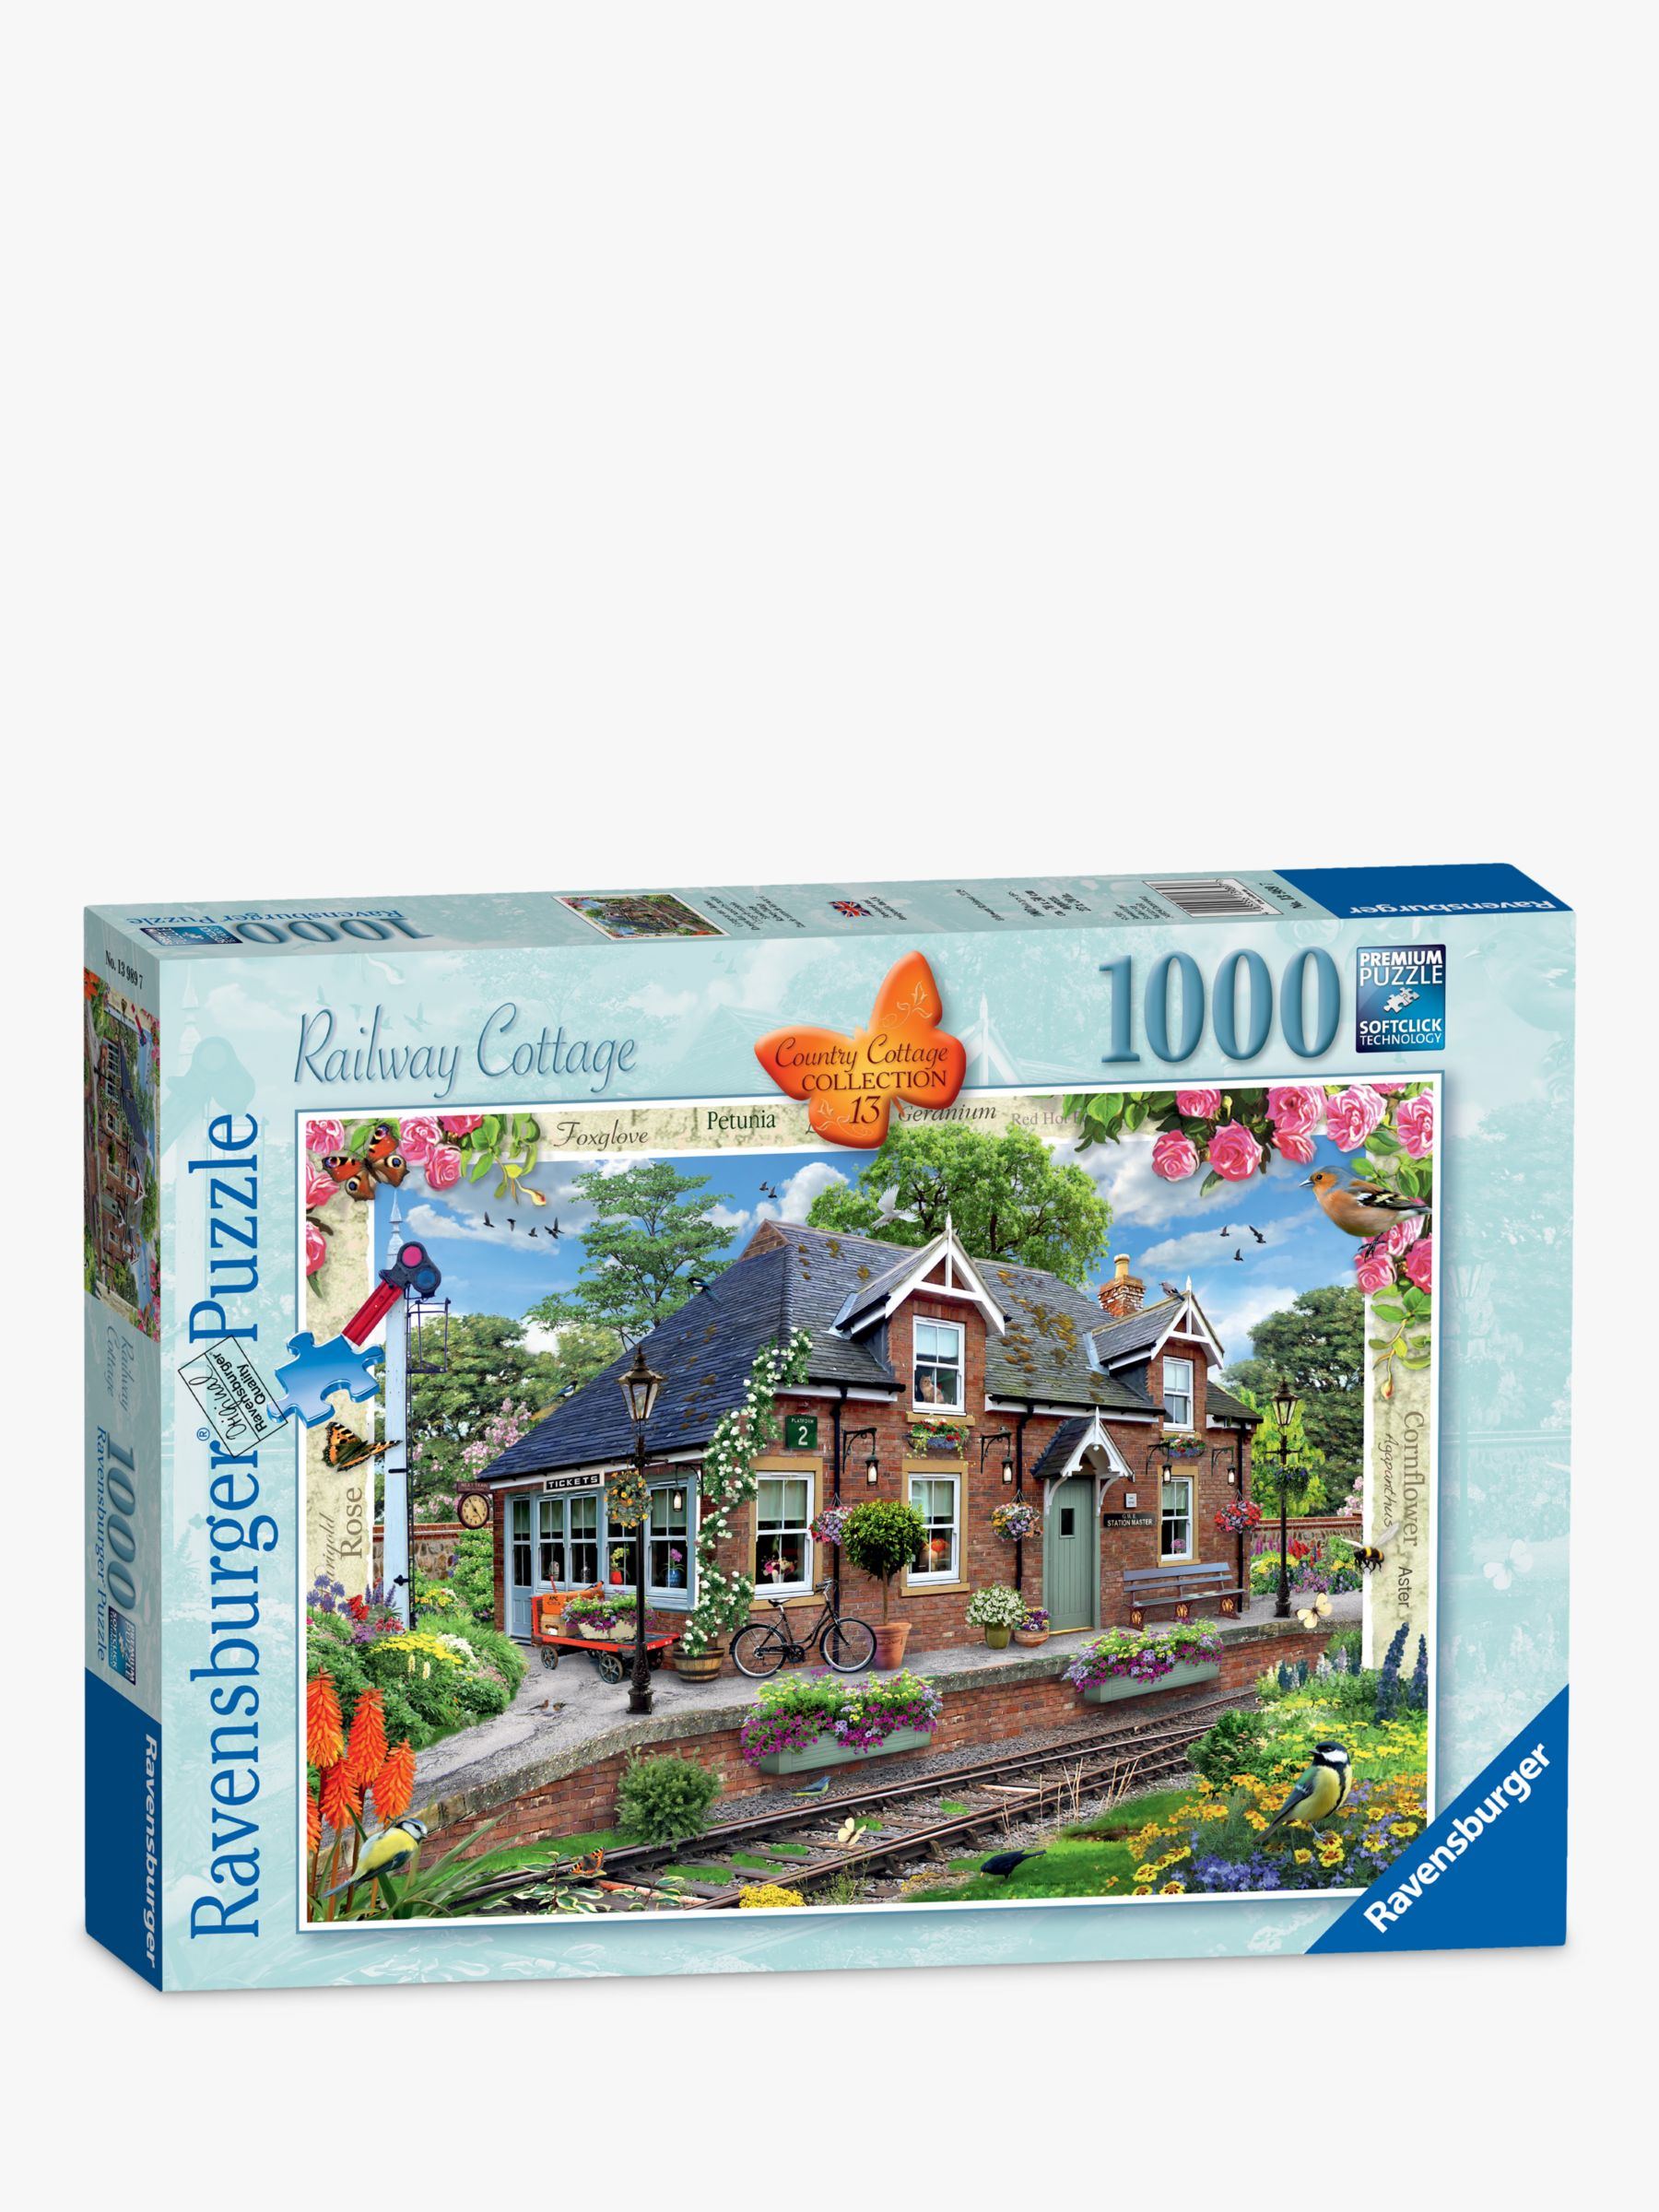 Ravensburger Ravensburger Railway Cottage Jigsaw Puzzle, 1000 Pieces